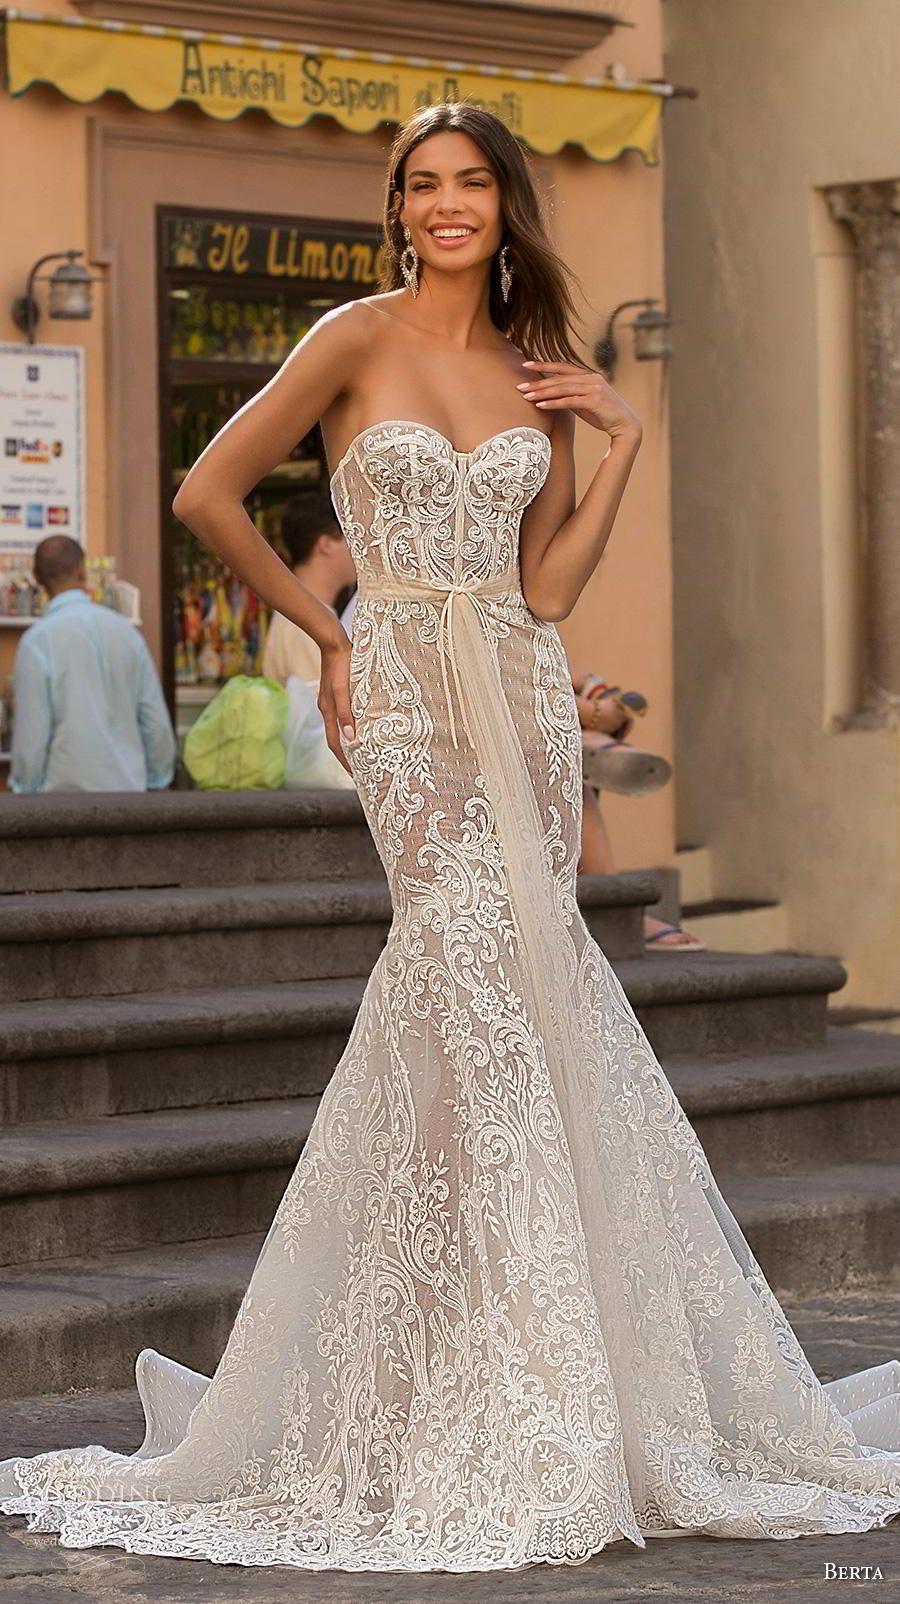 Berta Privee 2020 Wedding Dresses Amalfi Bridal Collection No 3 Wedding Inspirasi Wedding Dresses Romantic Strapless Lace Wedding Dress Trendy Wedding Dresses [ 1604 x 900 Pixel ]